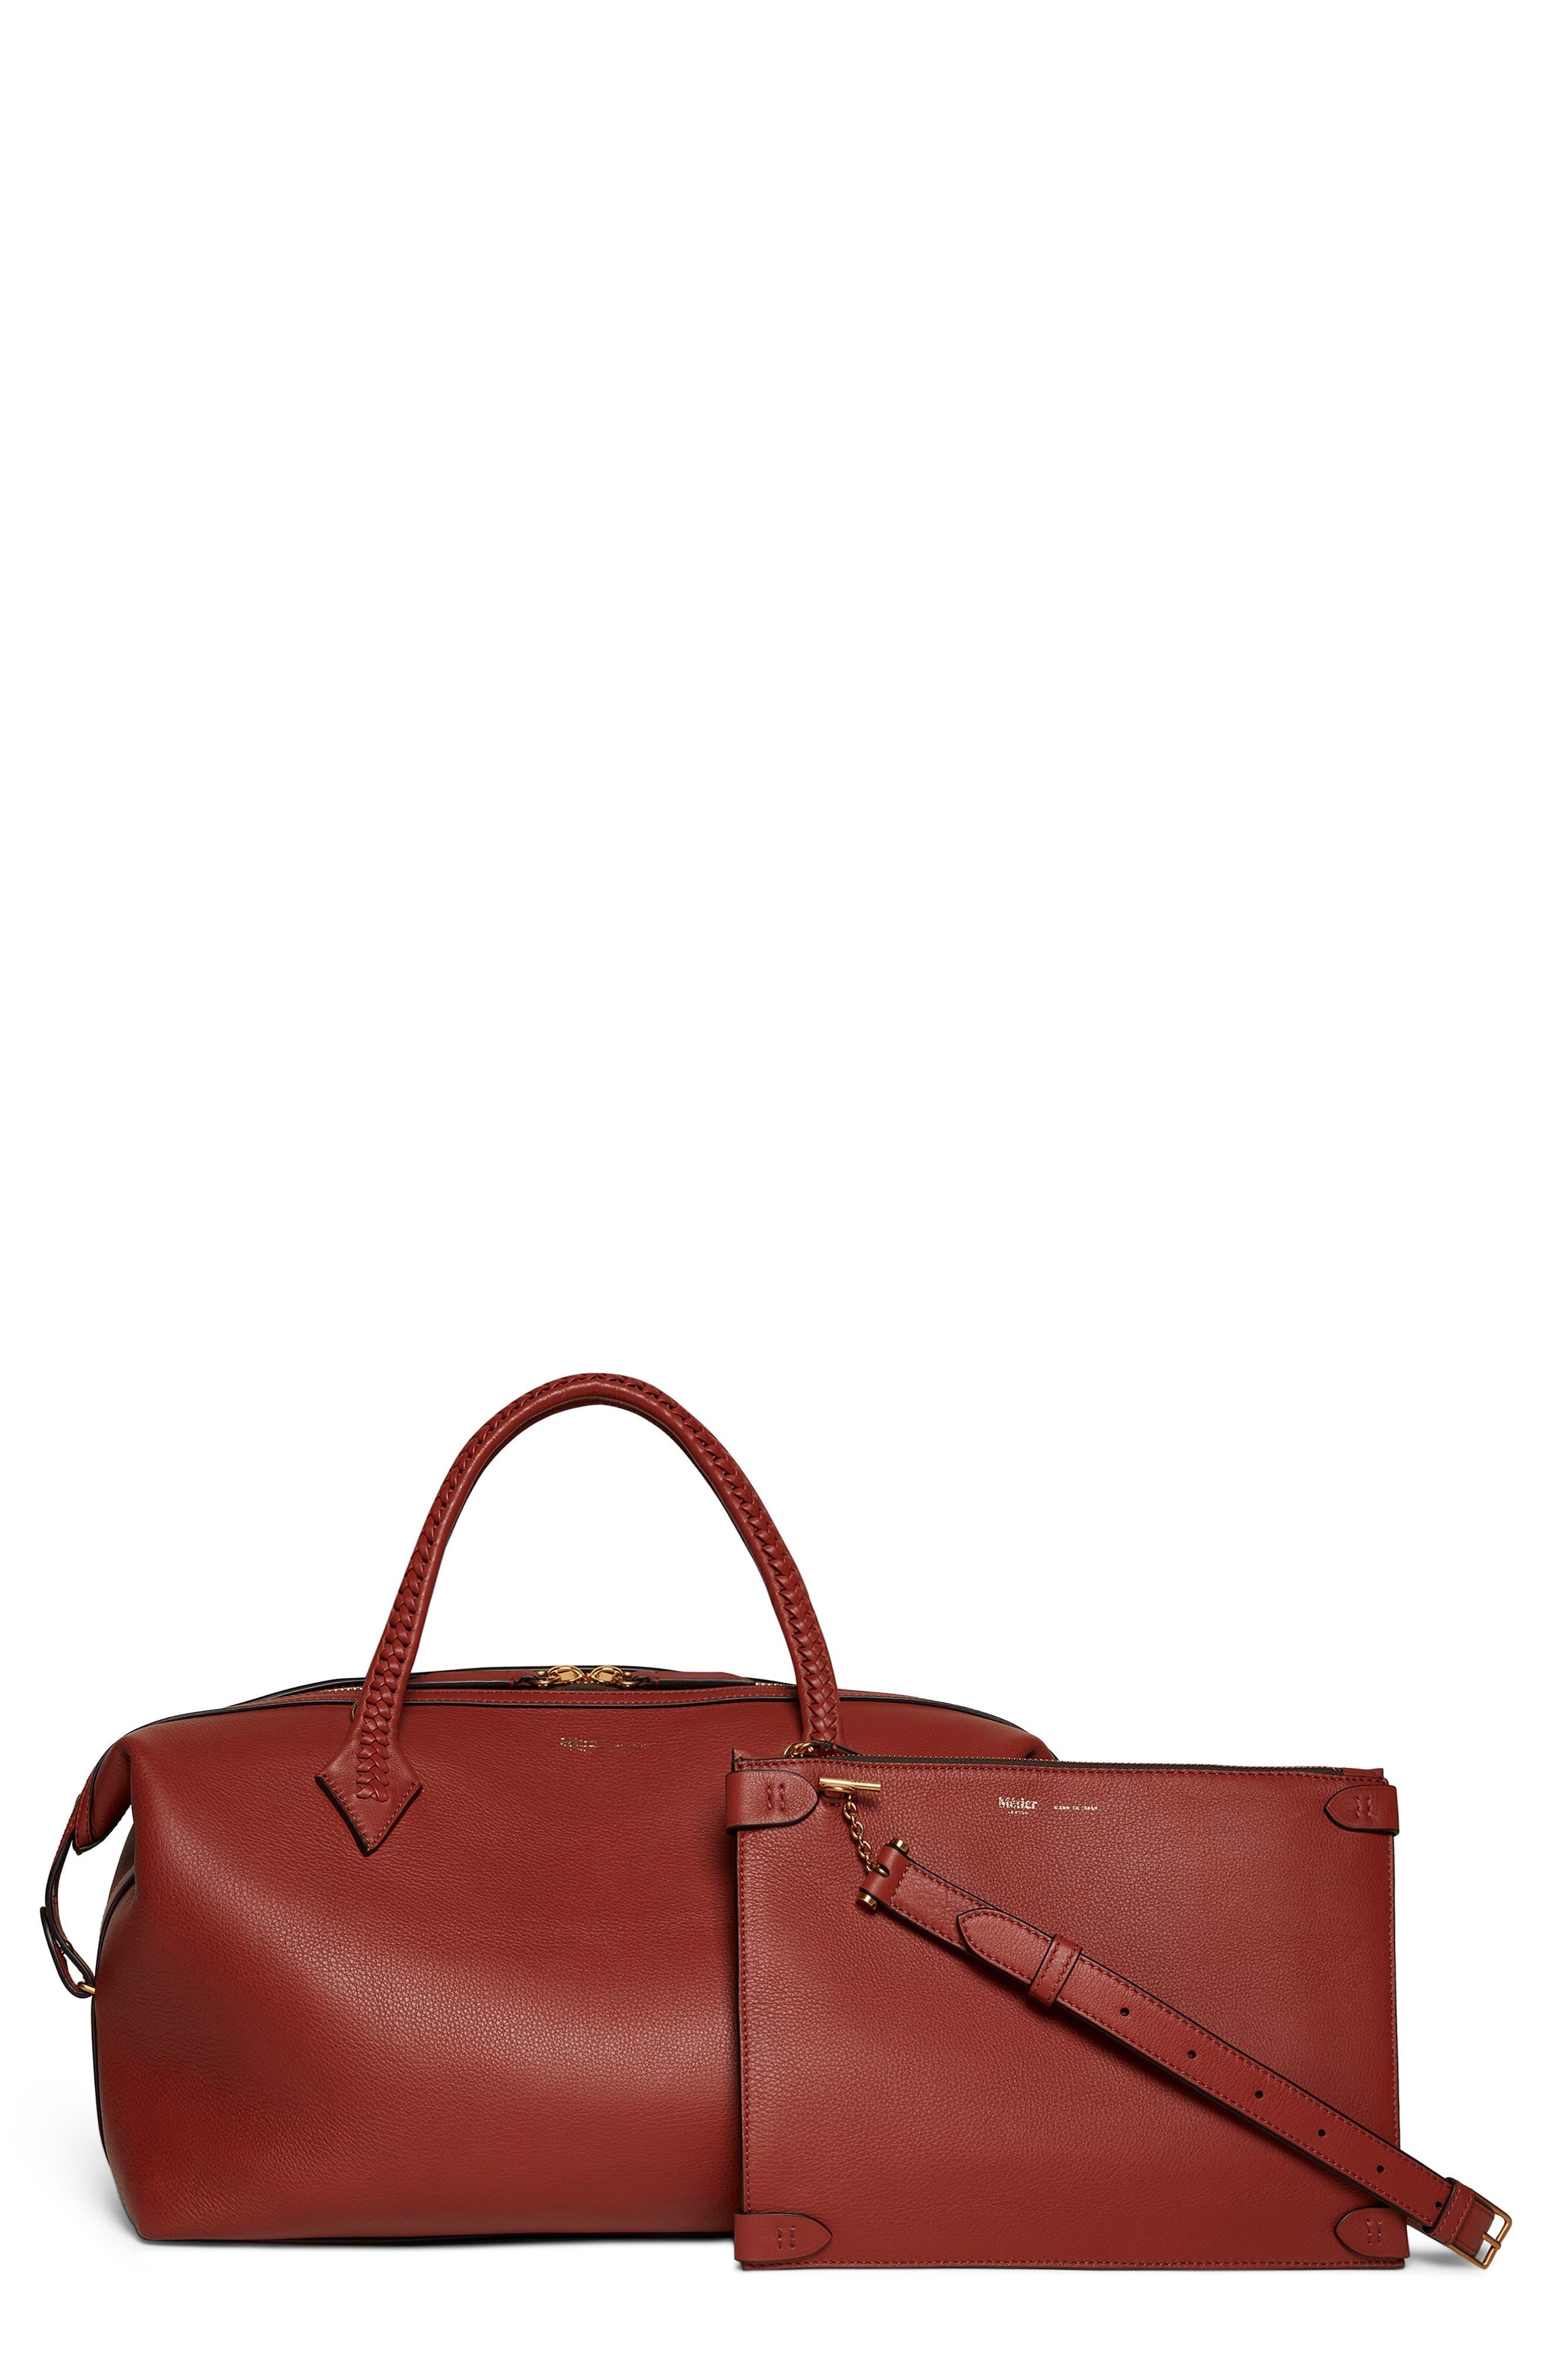 Perriand City Leather Duffel Handbag